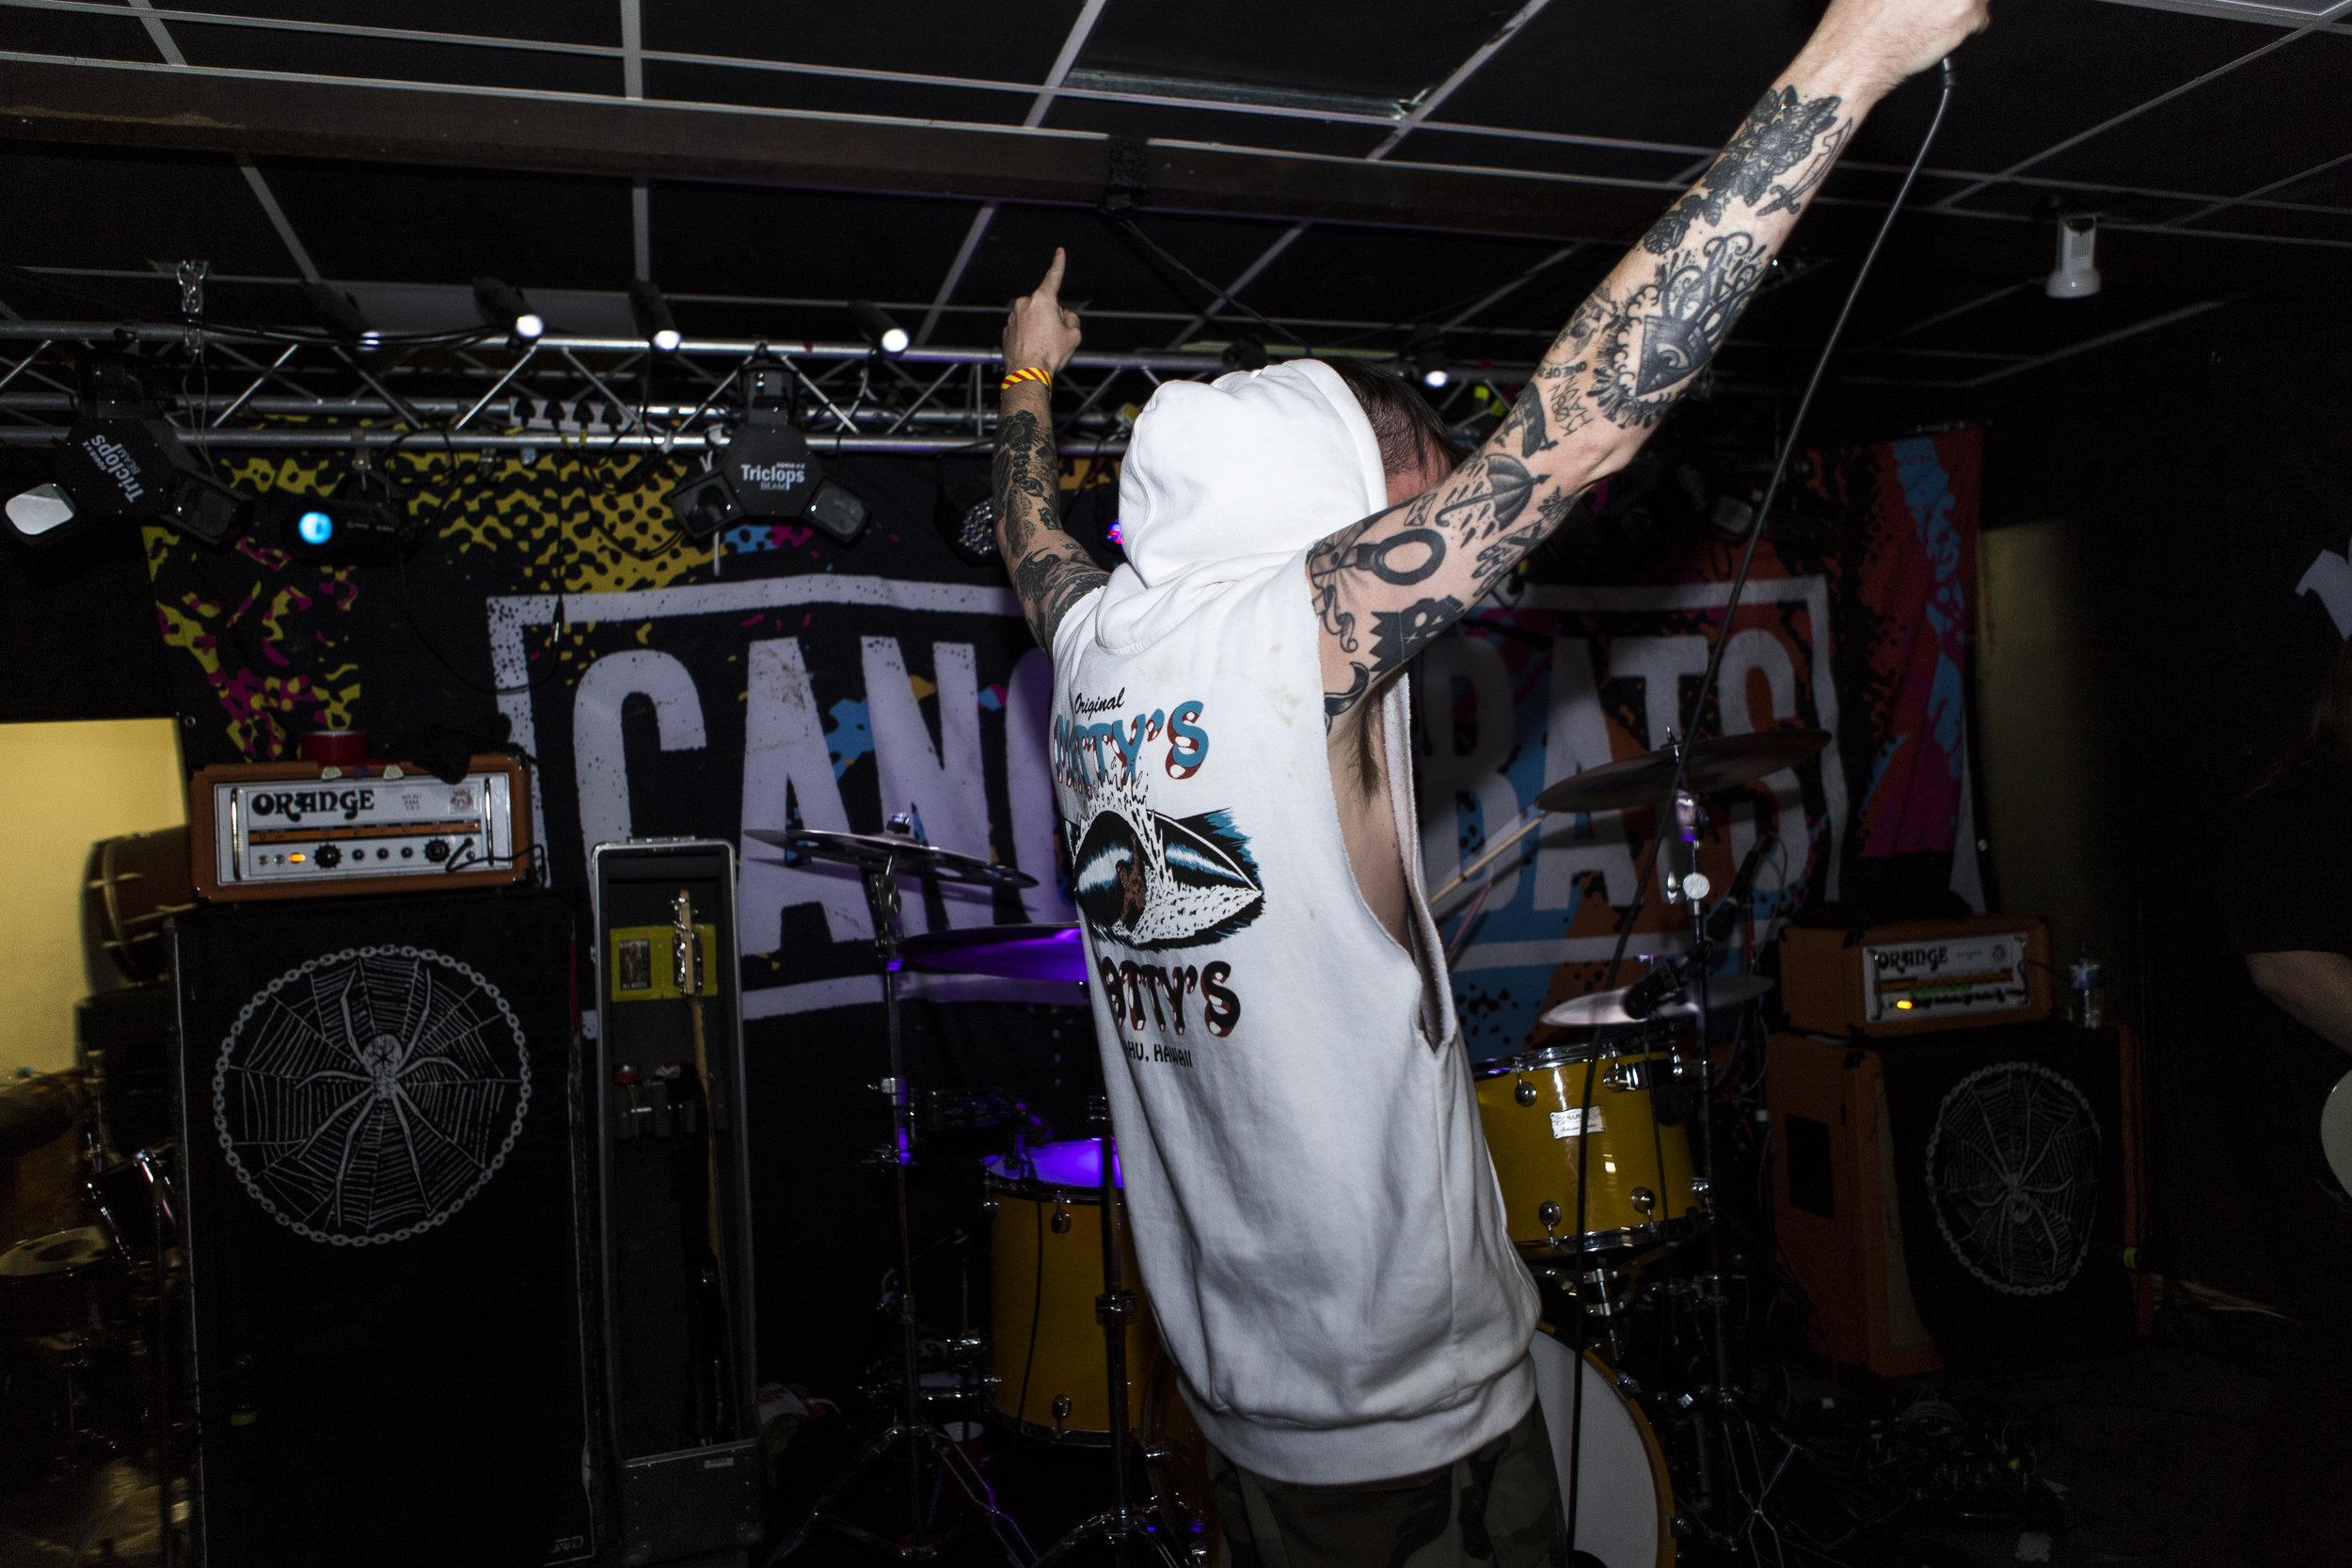 Cancerbats-4.jpg